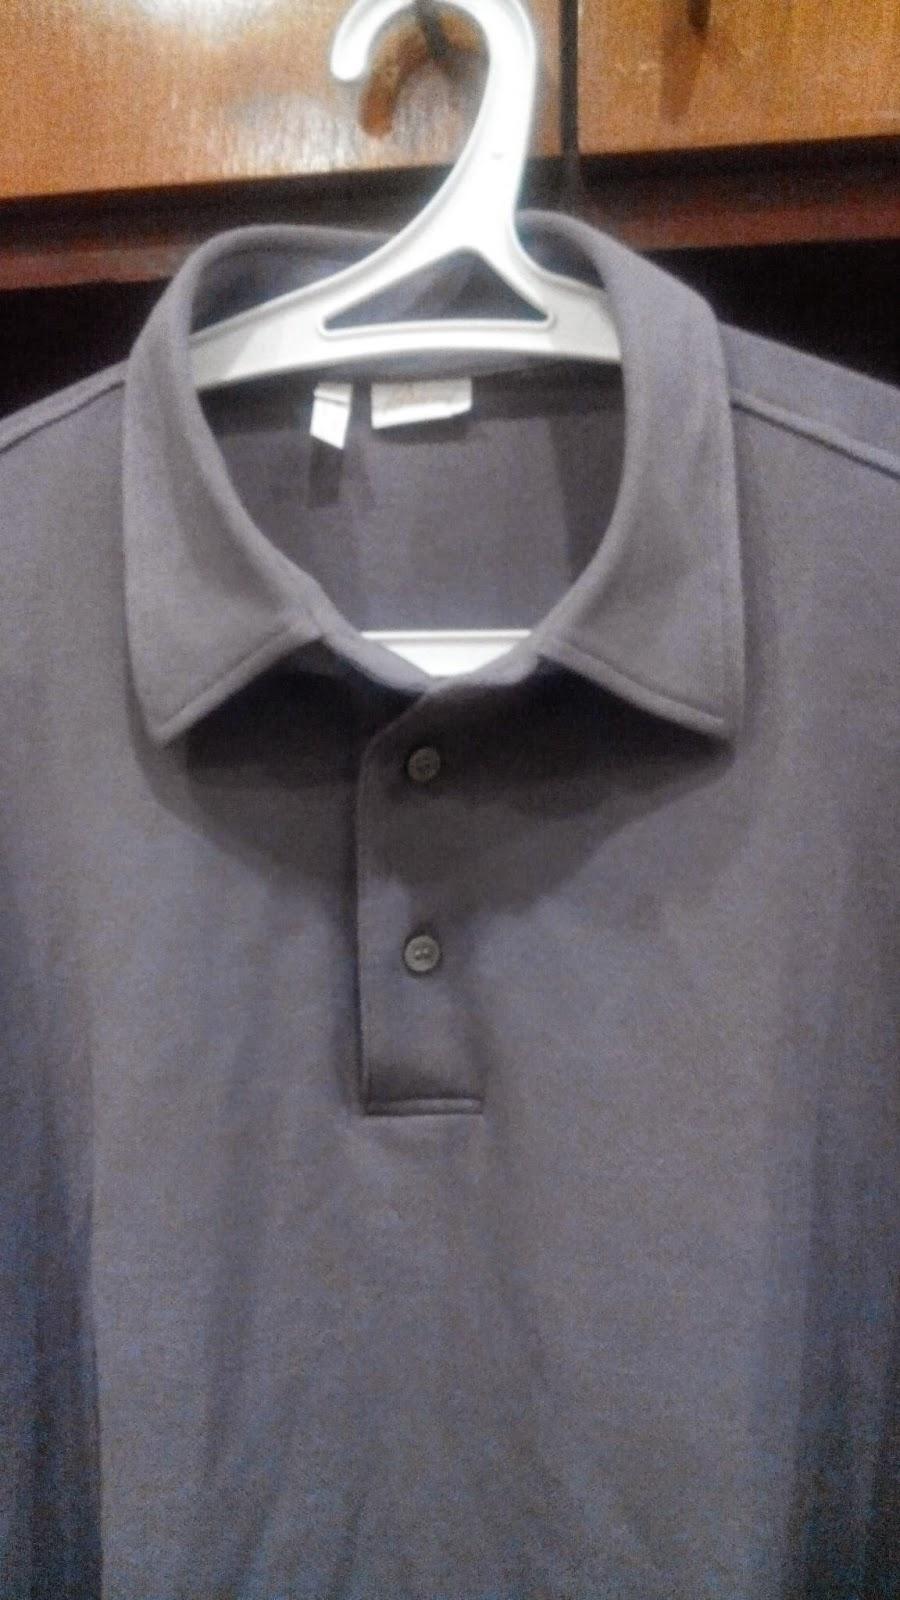 A Malaysian Man The High Collar Or Shirt Collar Polo Shirt Where